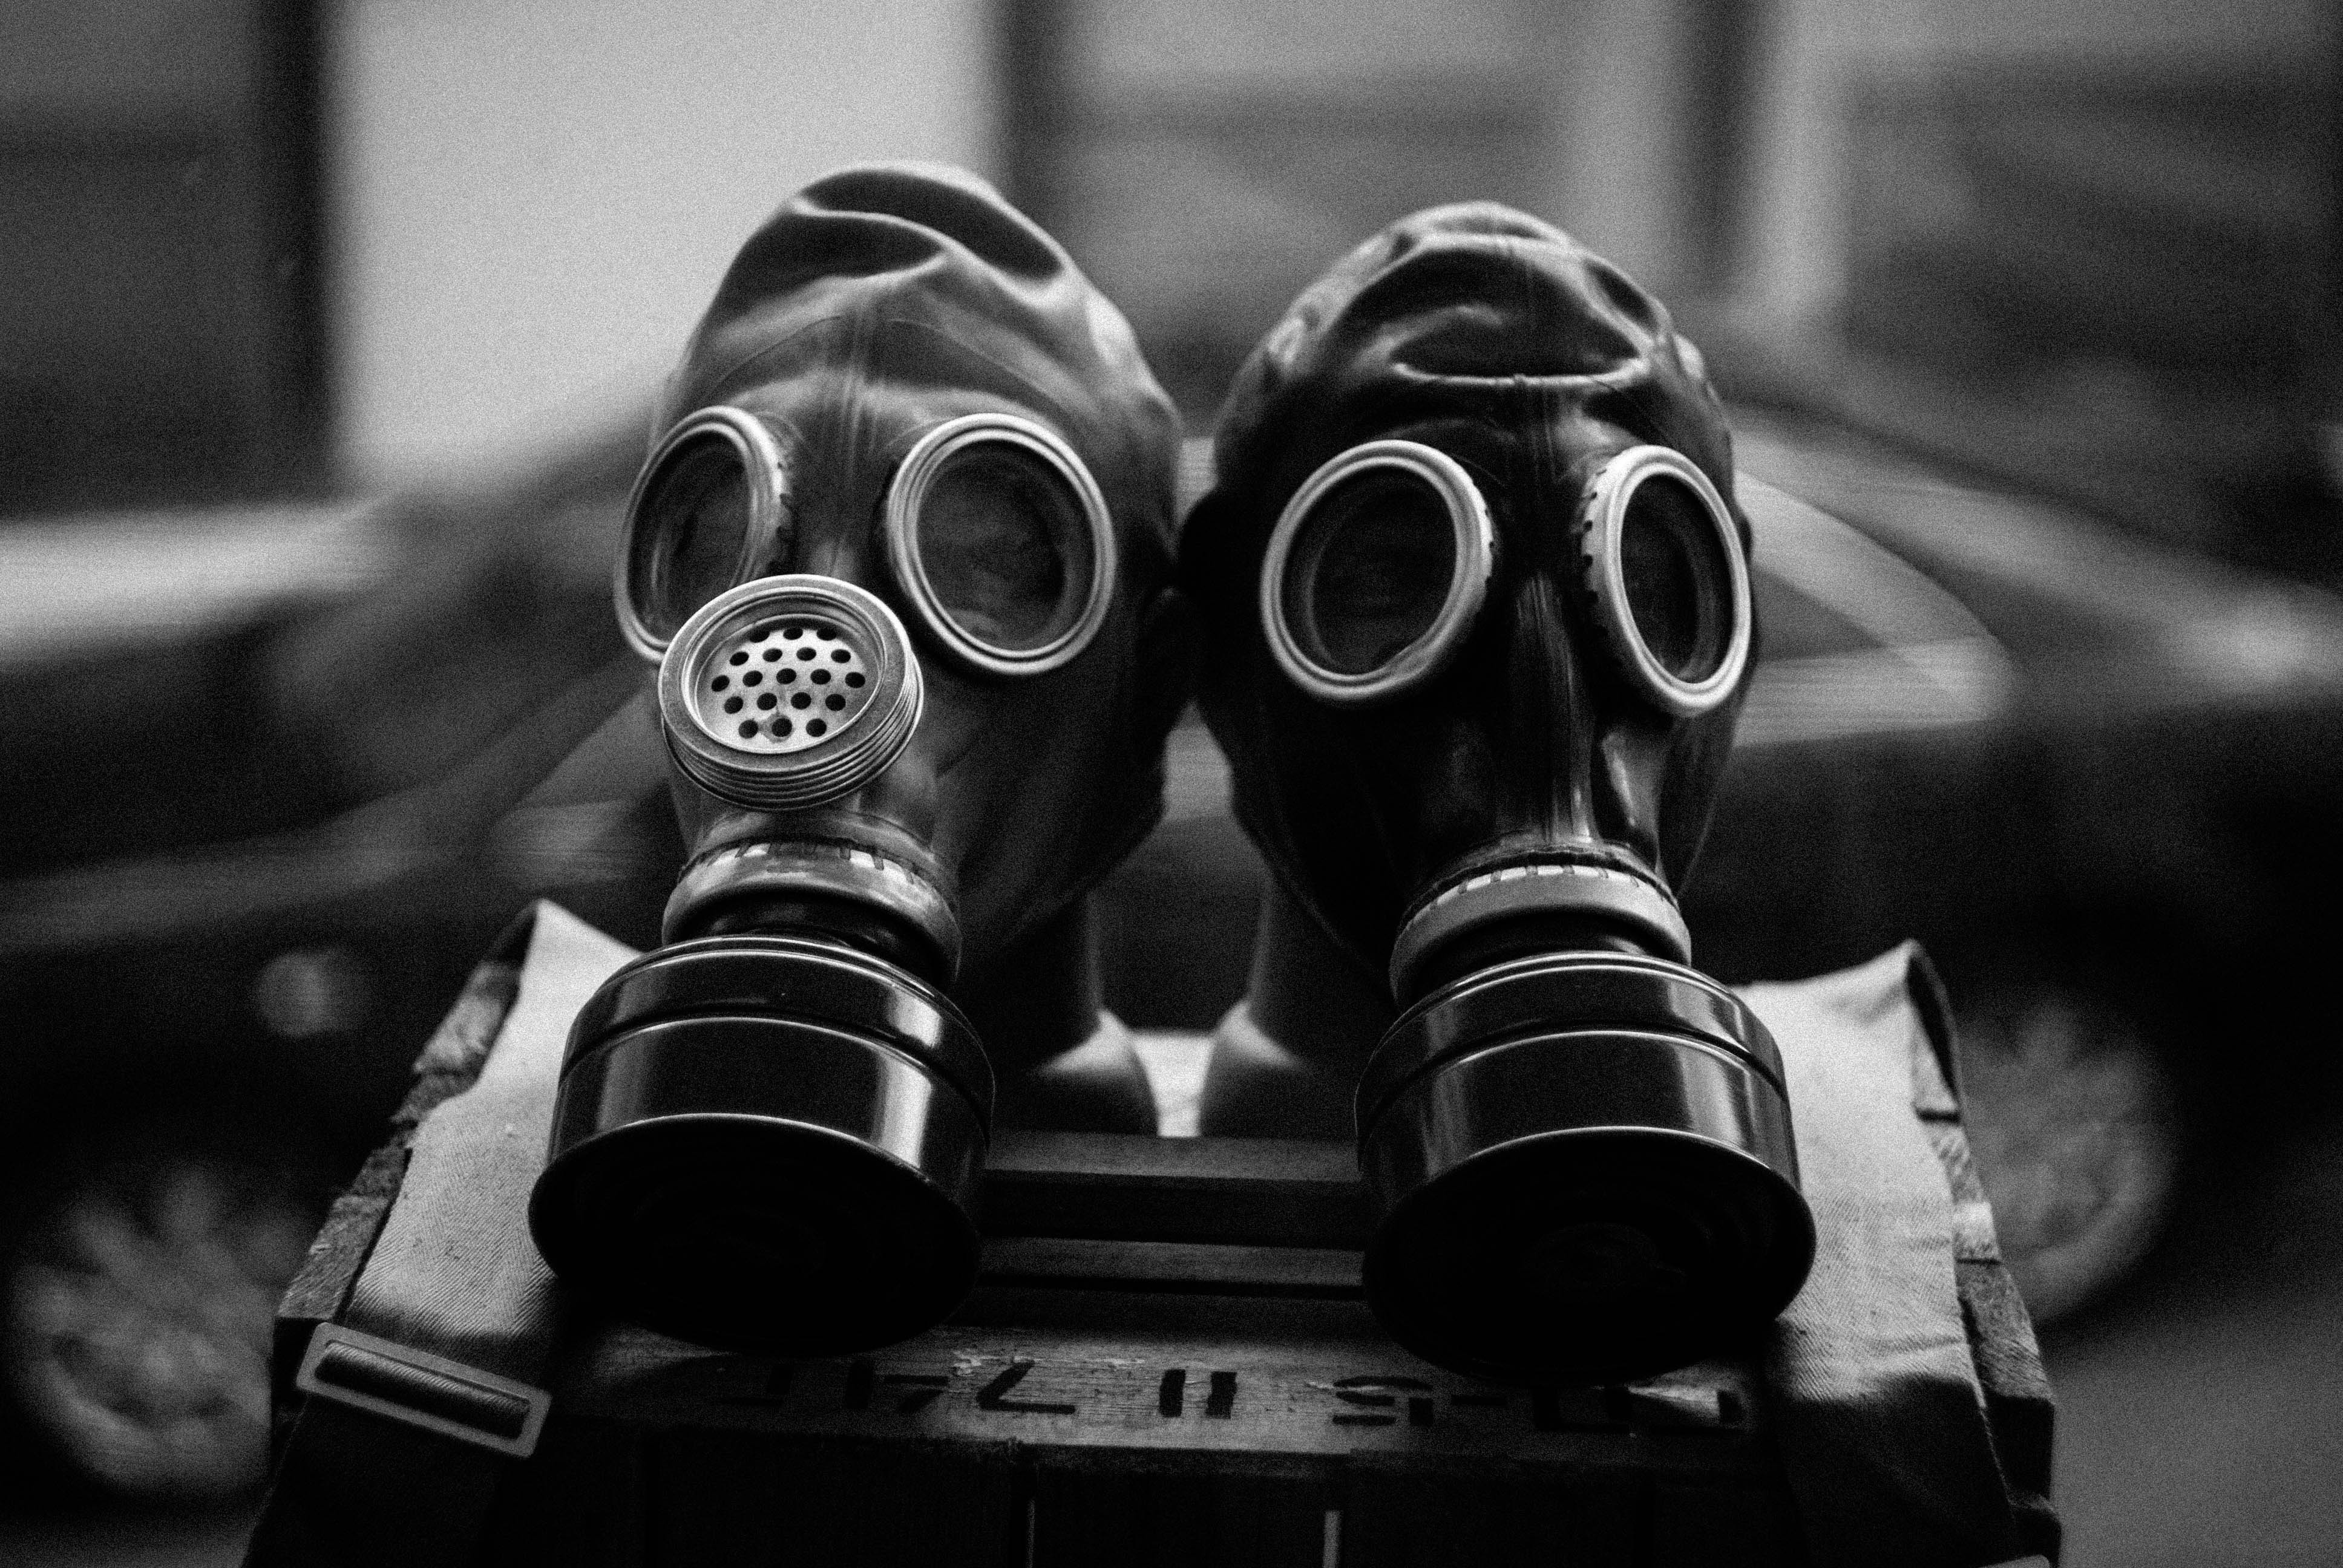 fungos radioativo chernobyl